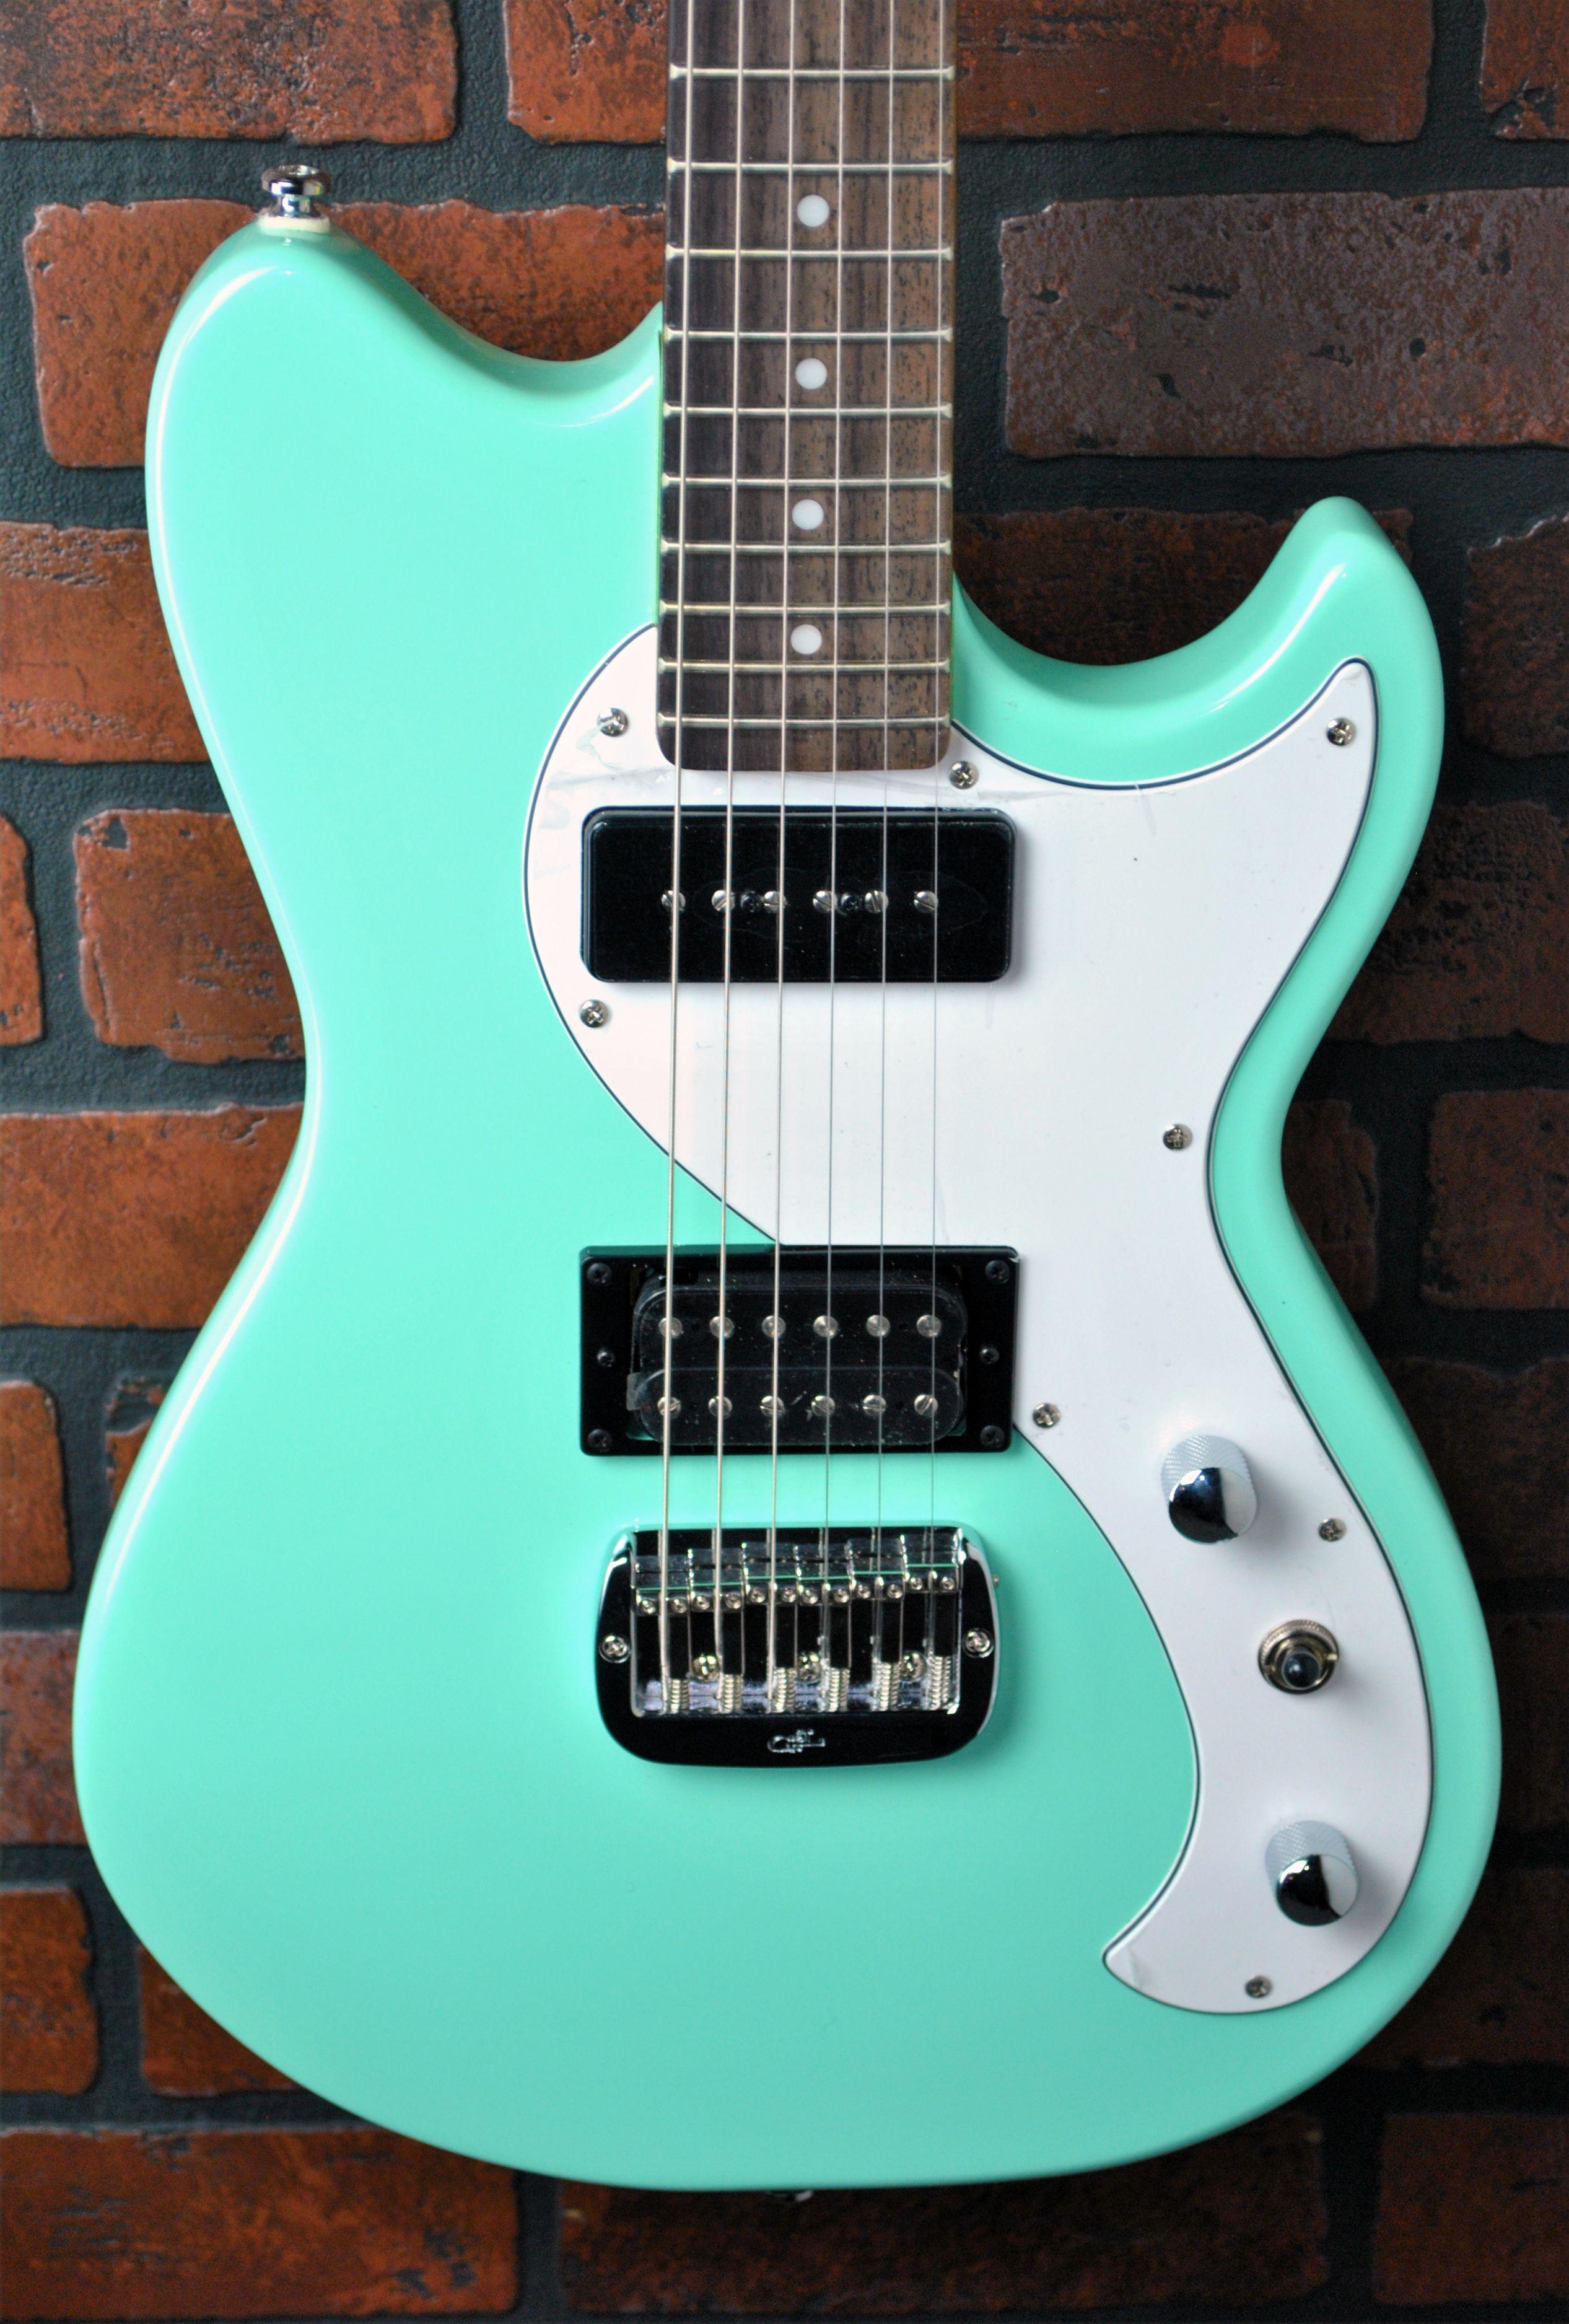 G&L USA Custom Built Fallout in Seafoam Green.